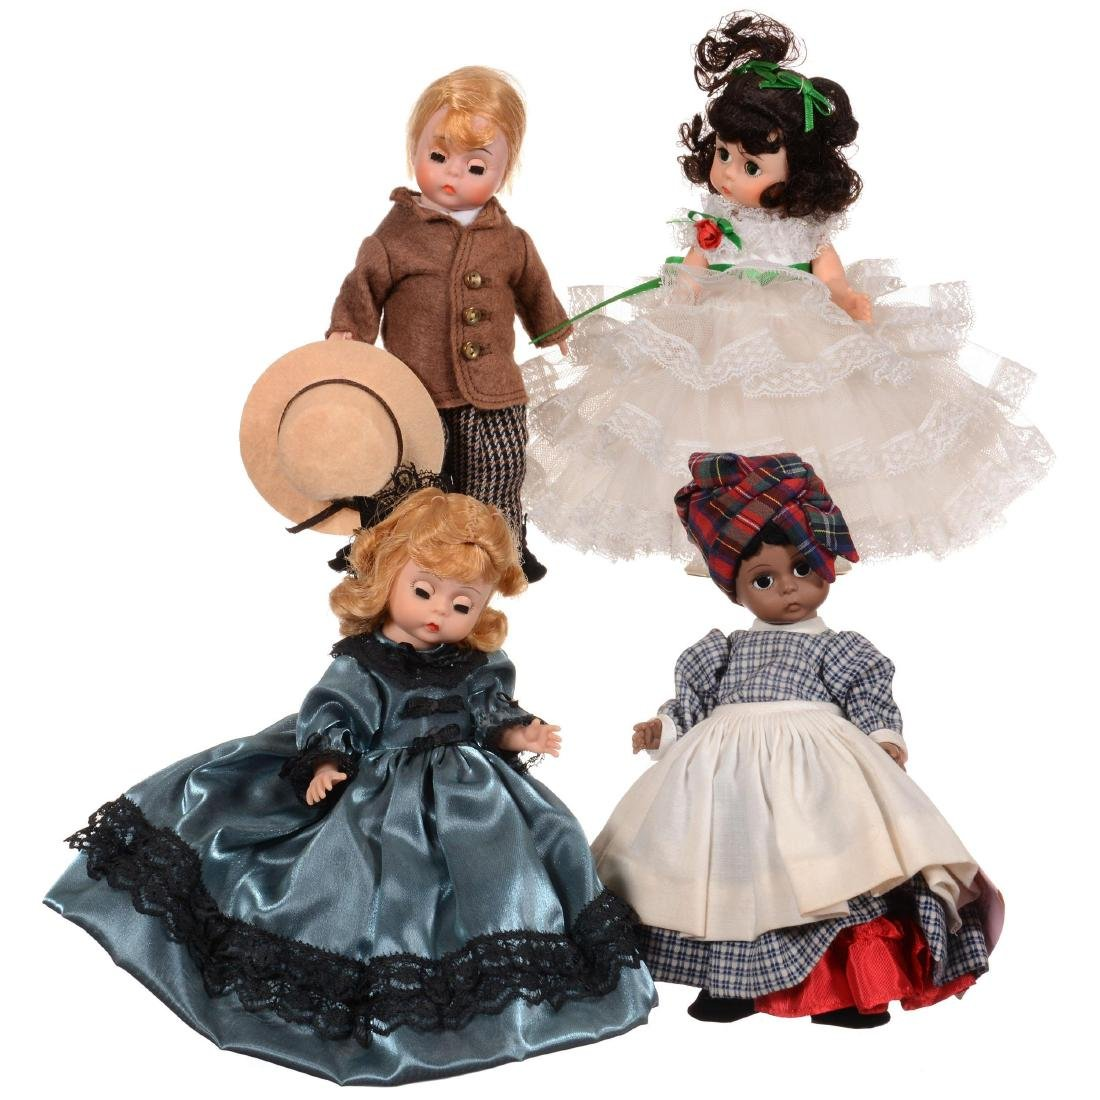 Ten Madame Alexander Dolls in Original Boxes